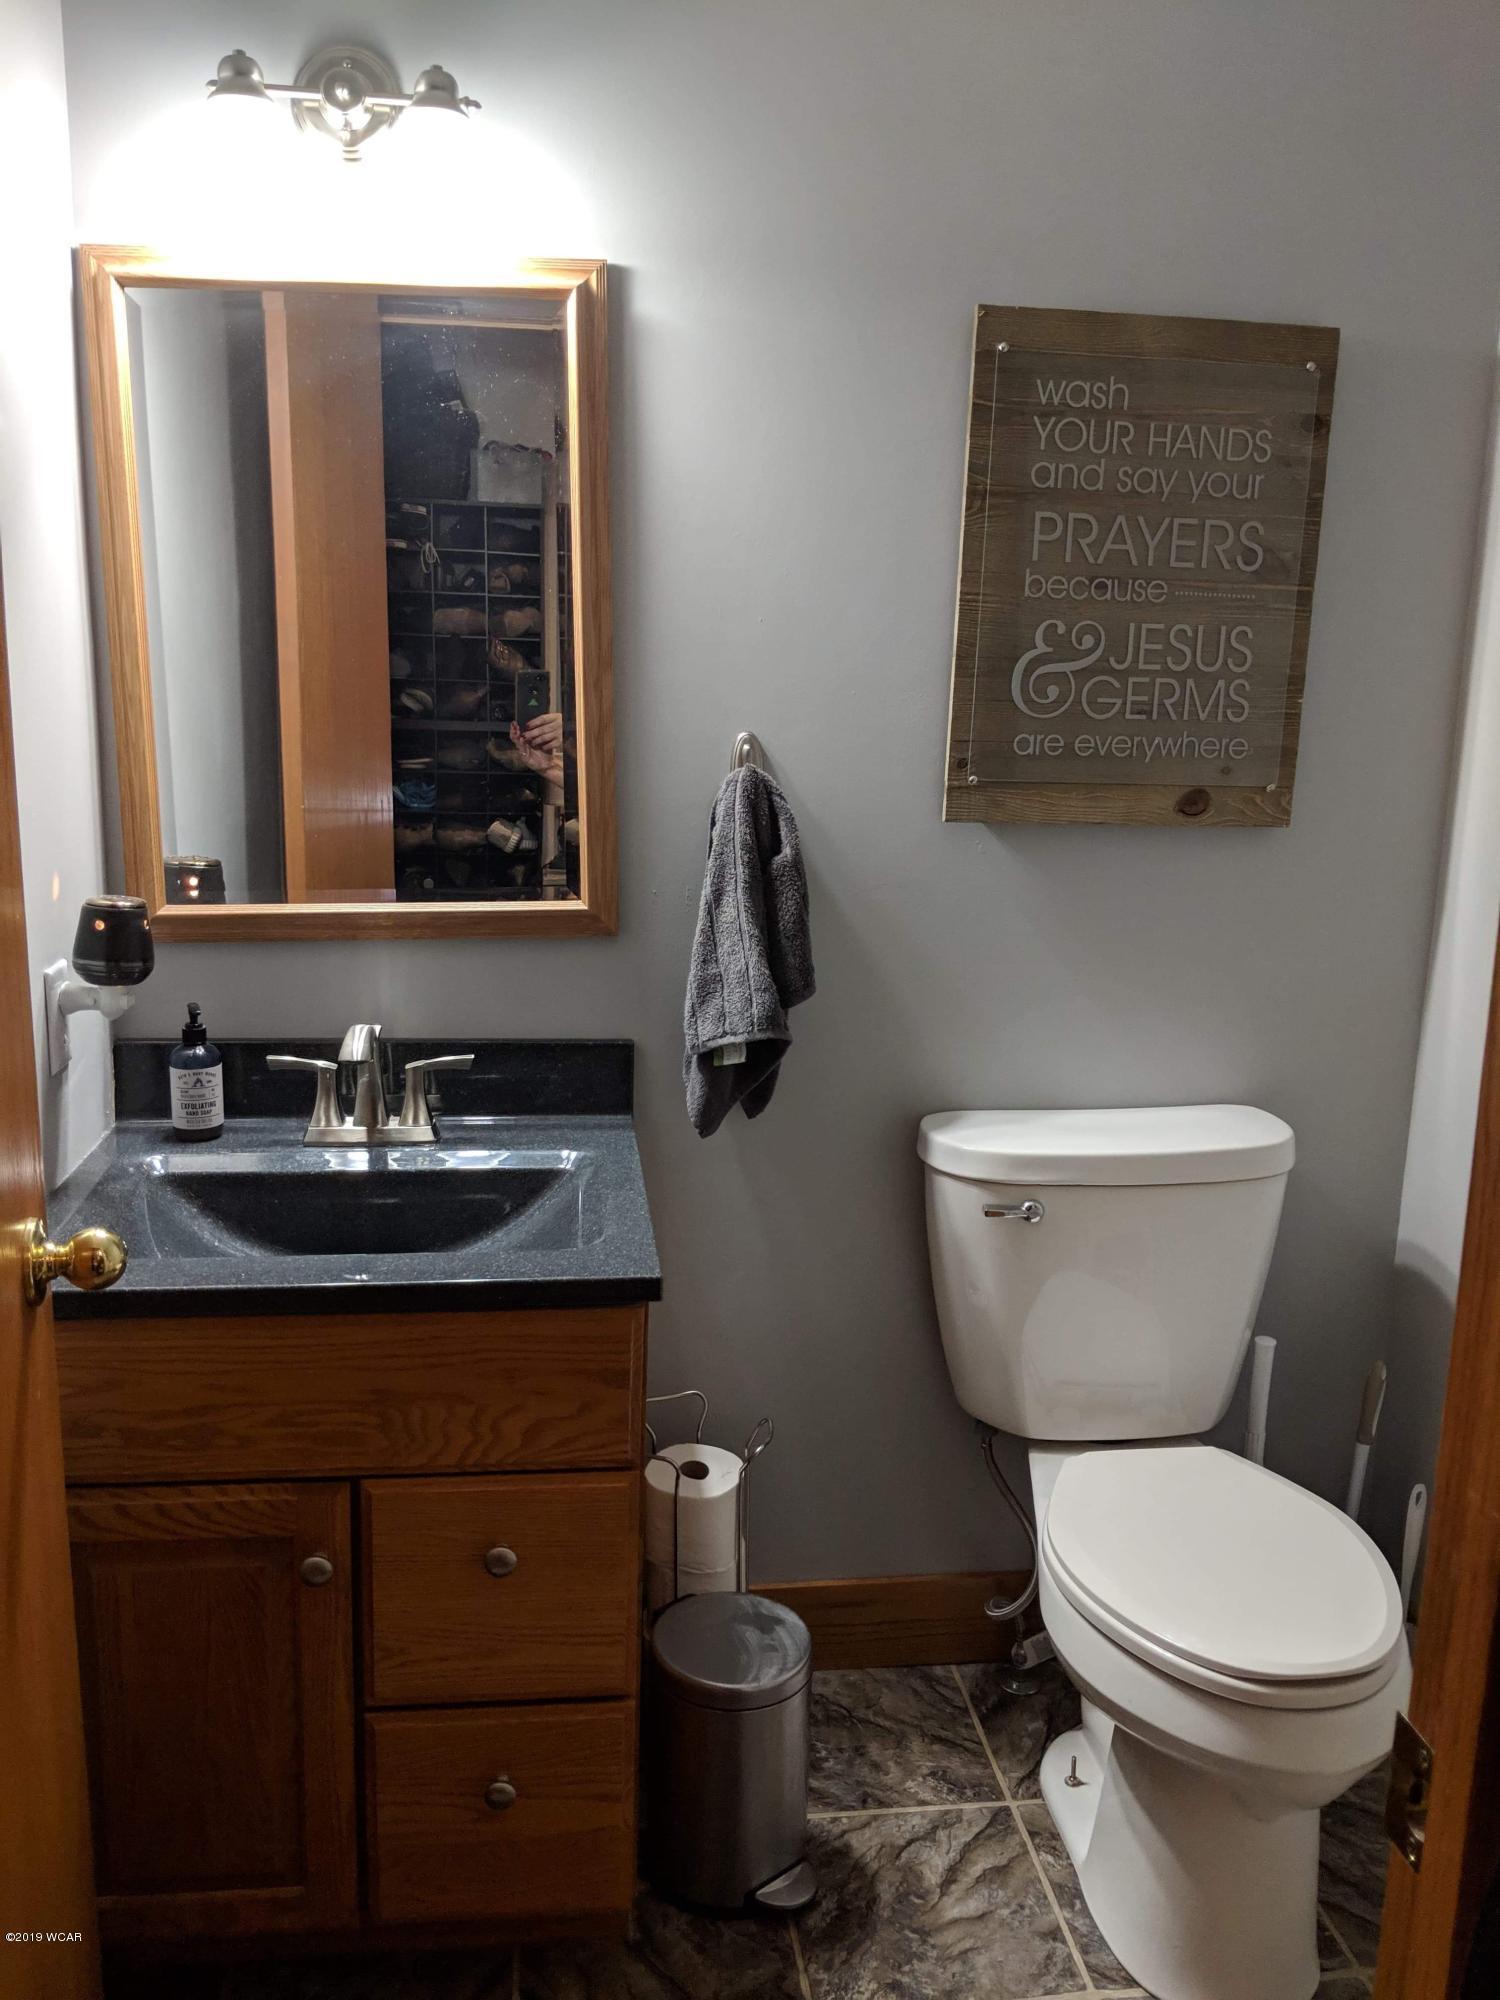 2005 11th Street,Willmar,4 Bedrooms Bedrooms,3 BathroomsBathrooms,Single Family,11th Street,6033346